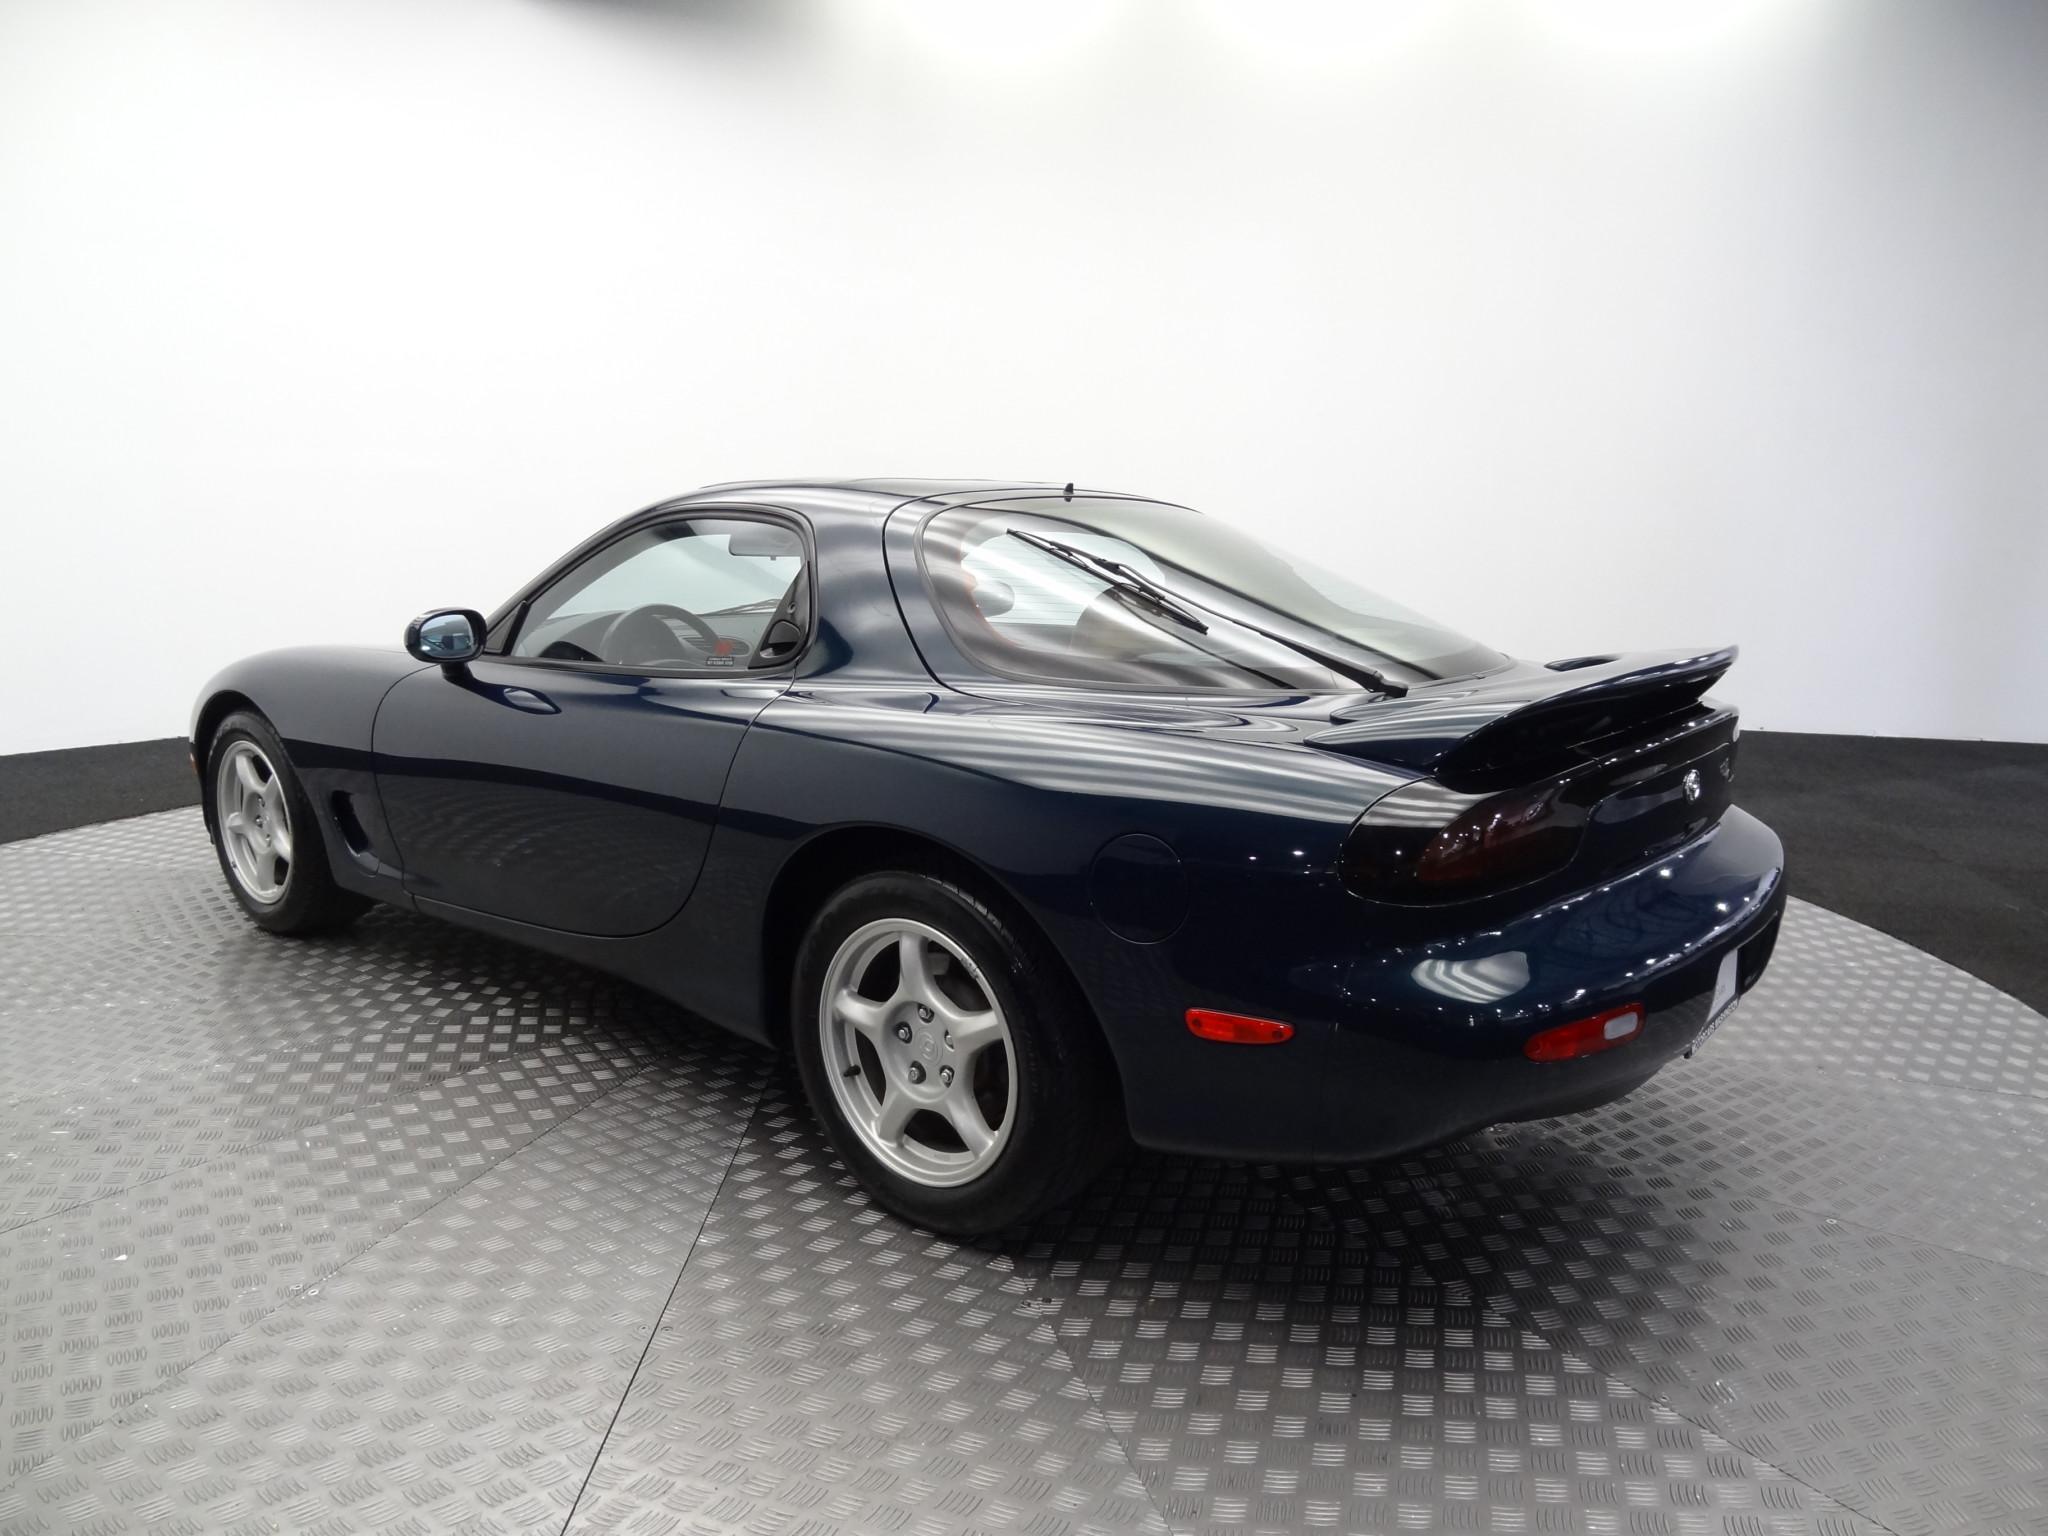 1994 Mazda RX-7 3/4 rear